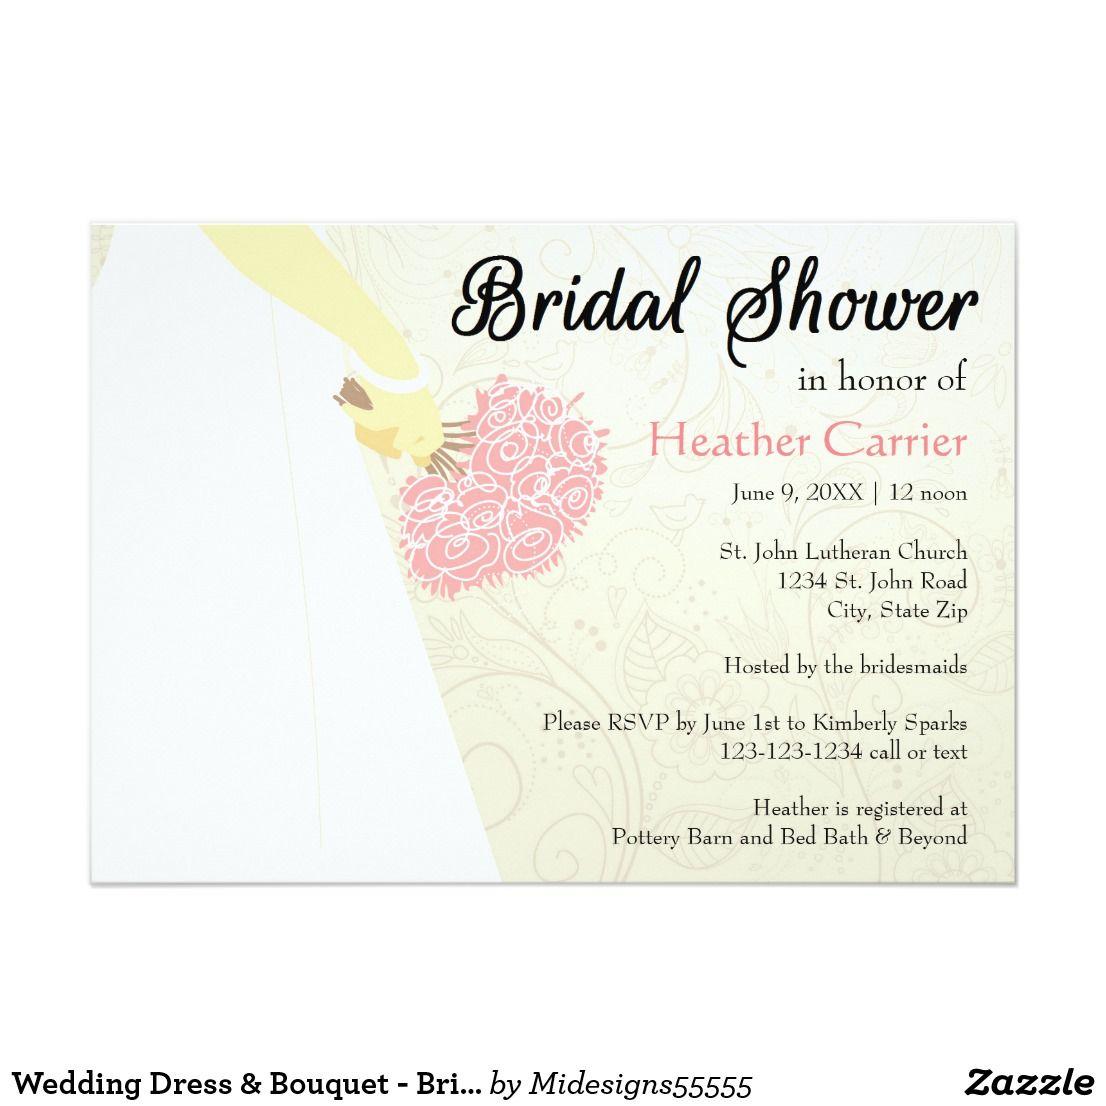 Design your own wedding dress for fun  Wedding Dress u Bouquet  Bridal Shower Invitation  Invites wedding